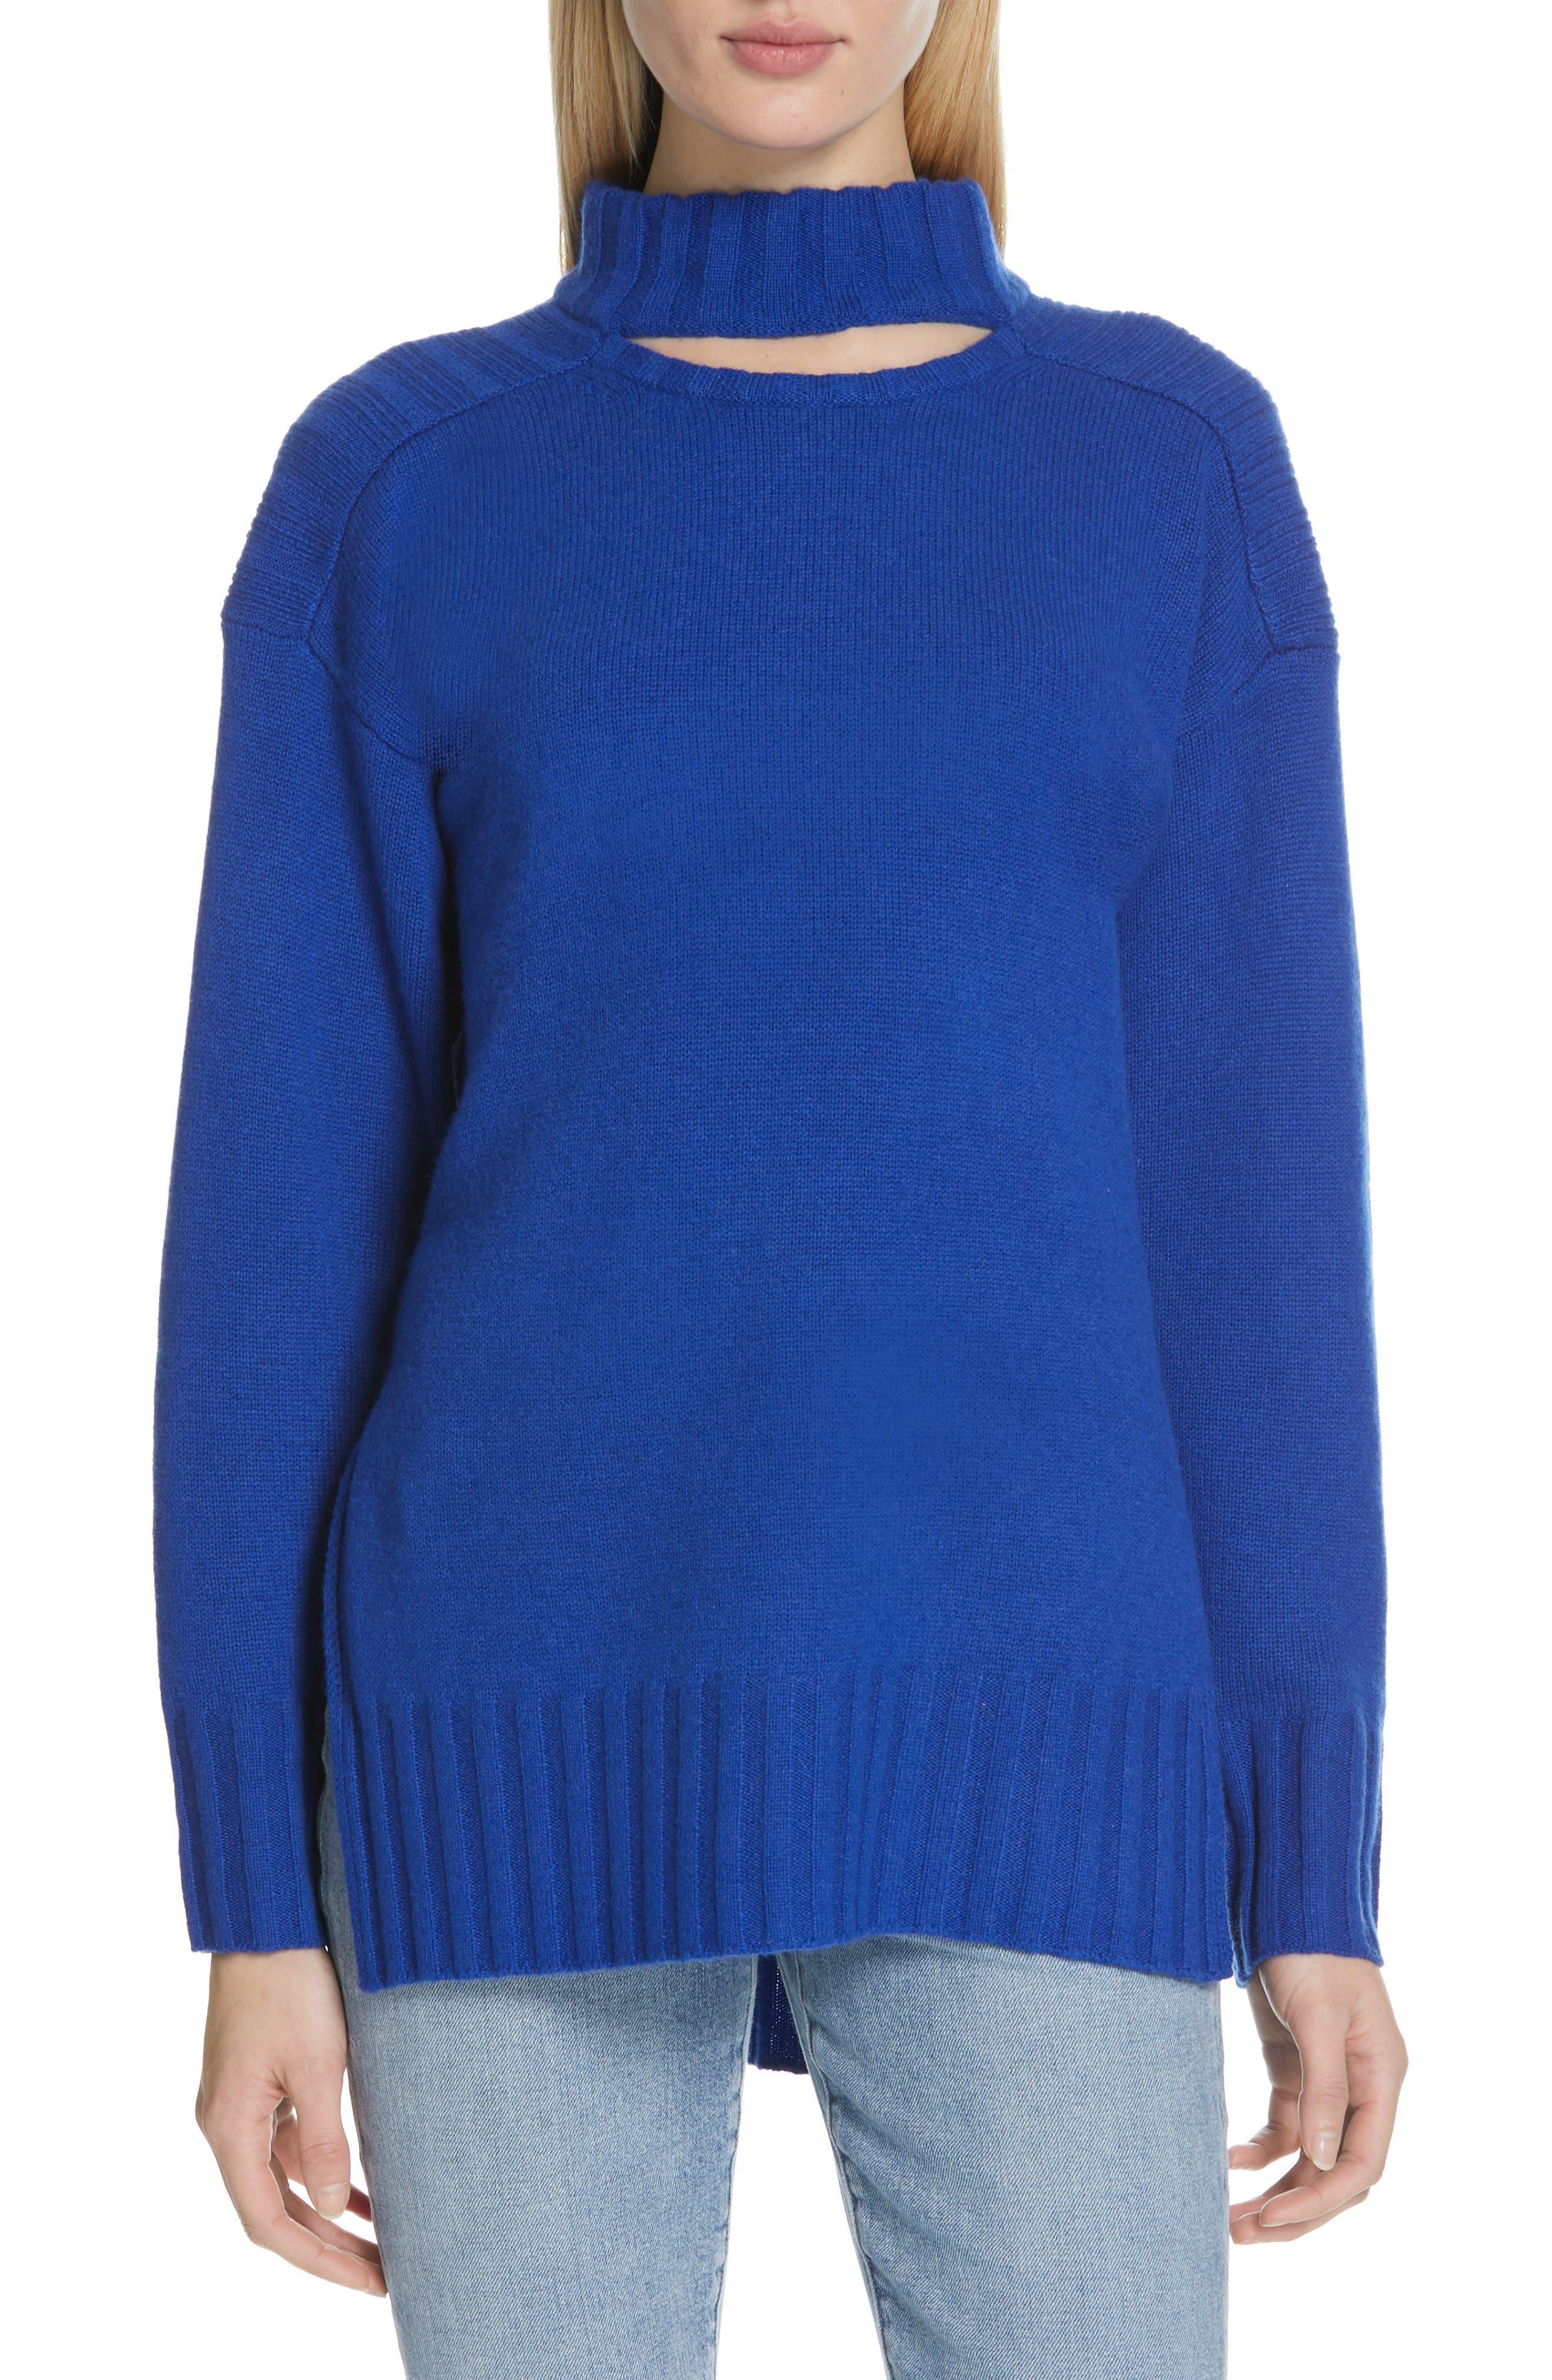 Equipment Stratford Wool & Cashmere Sweater, Blue